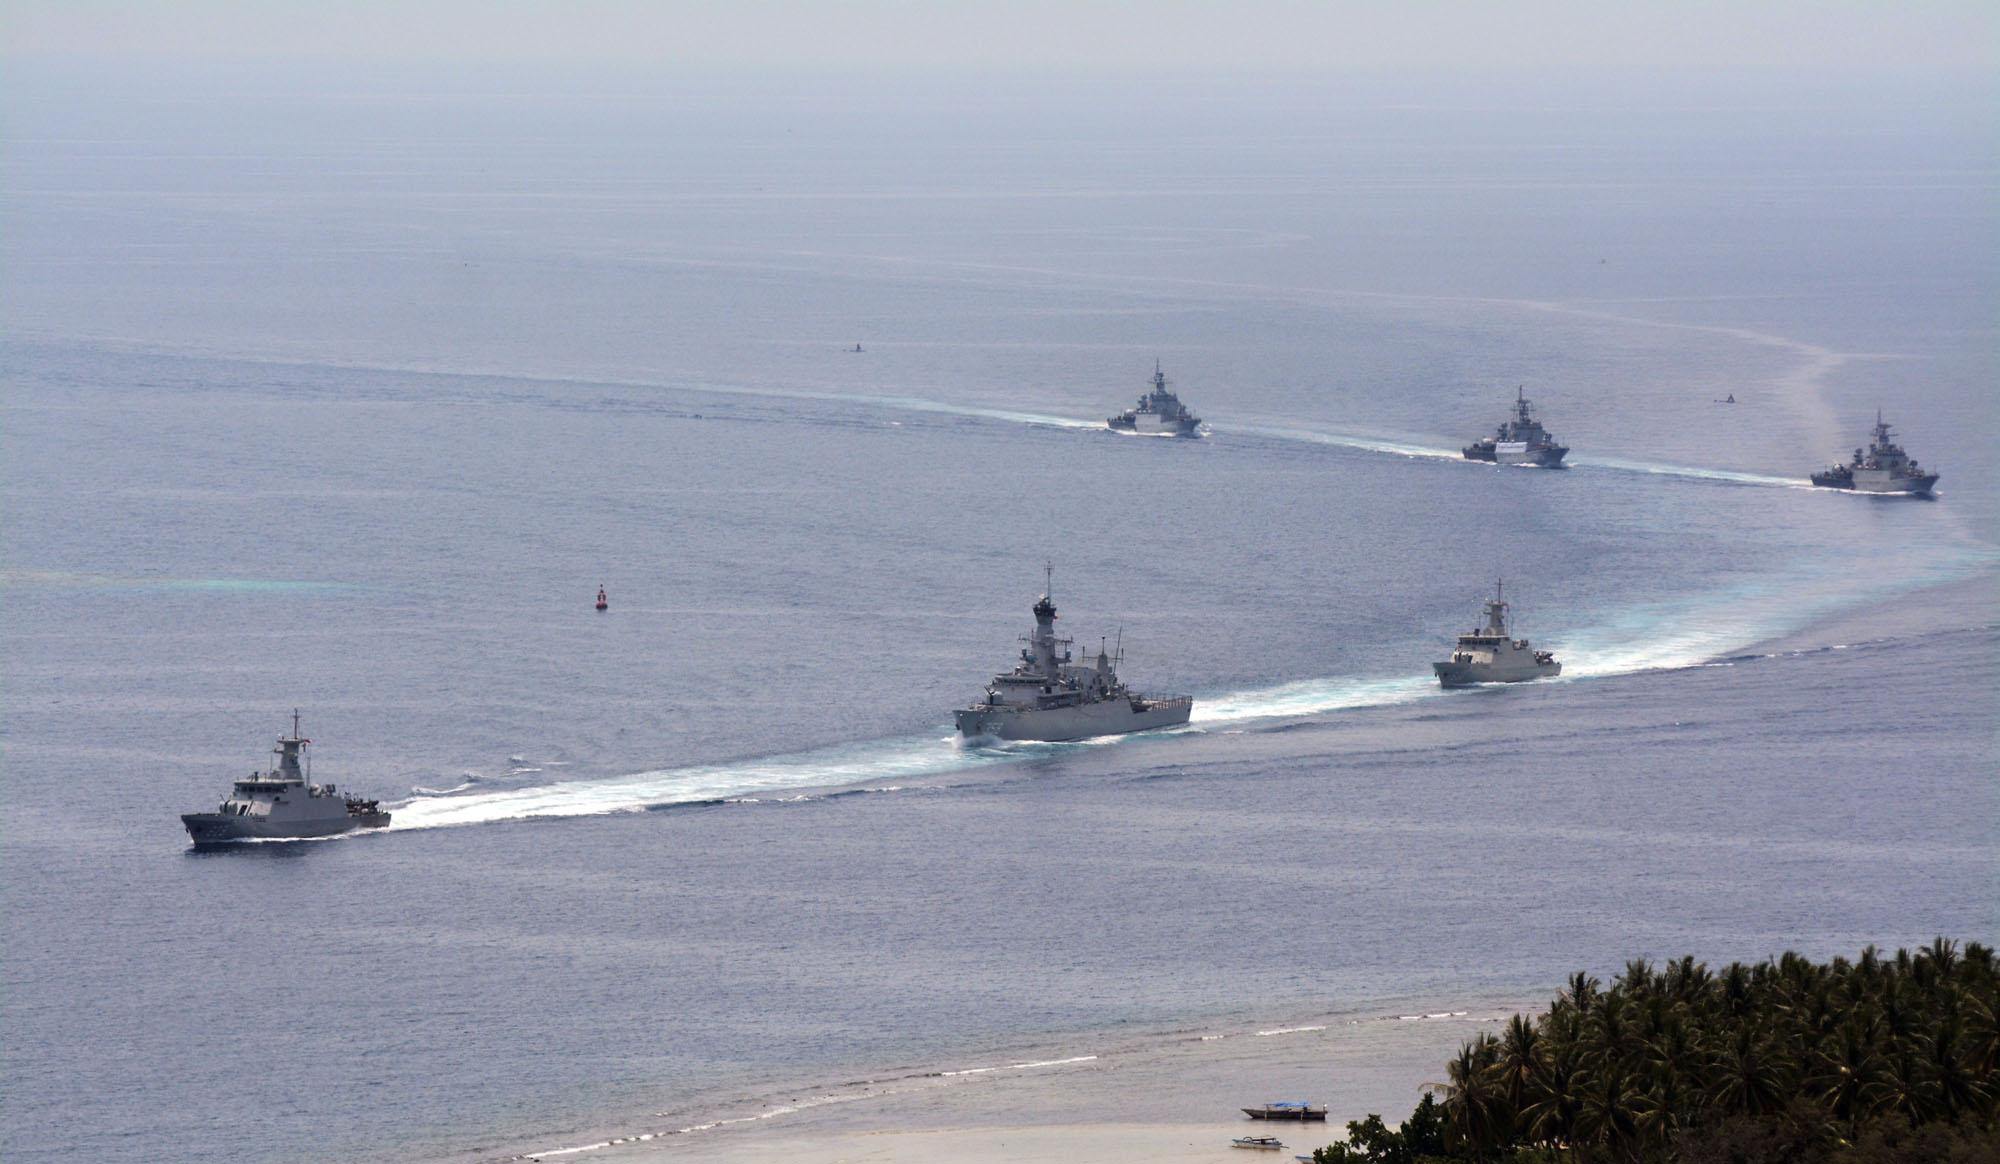 TNI-AL kerahkan 7 Kapal Perang di Natuna | aktual.com